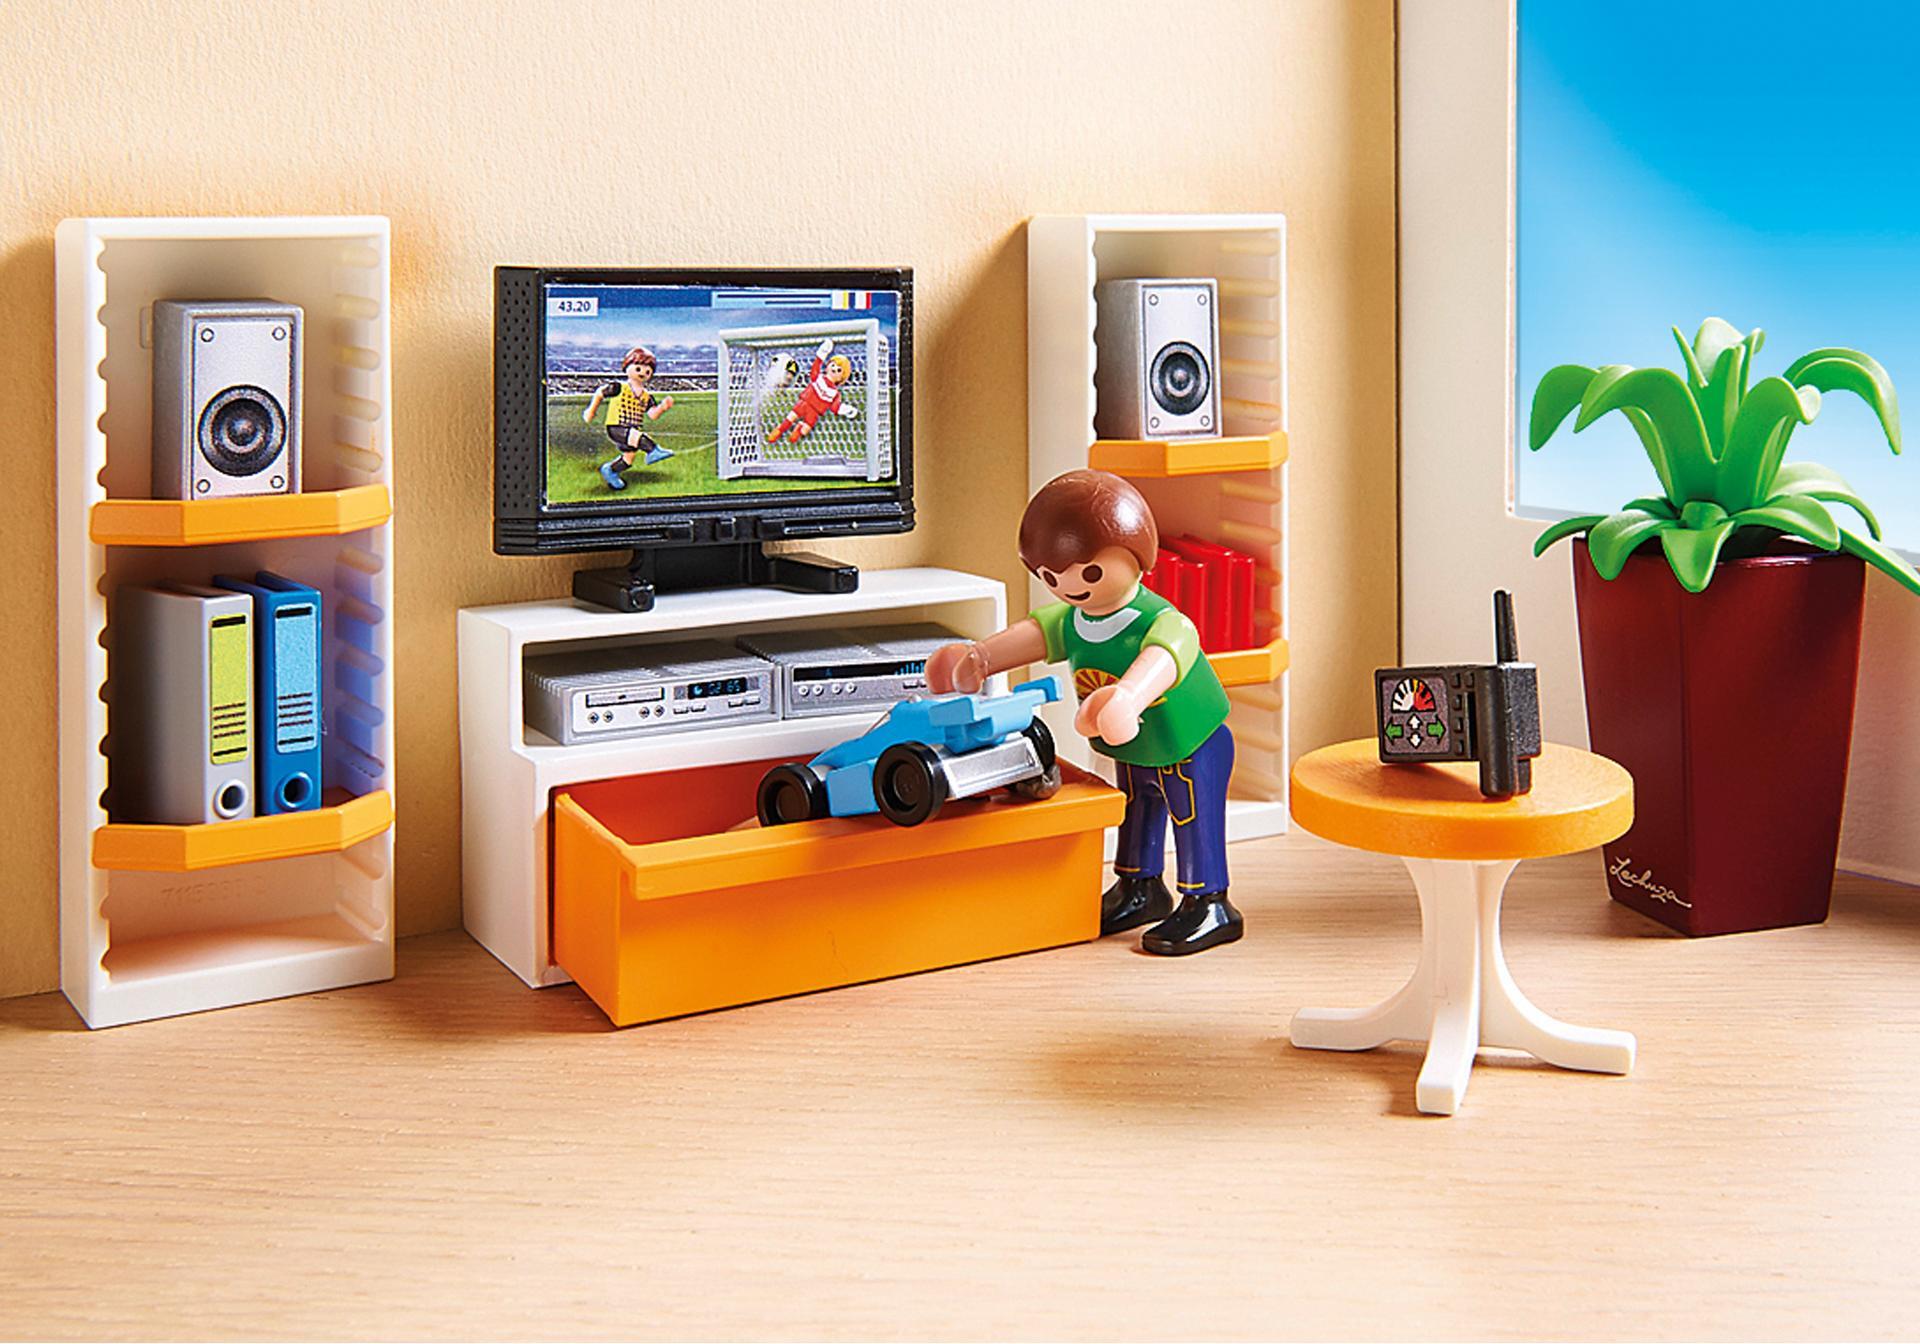 Living room 9267 playmobil for Playmobil living room 4282